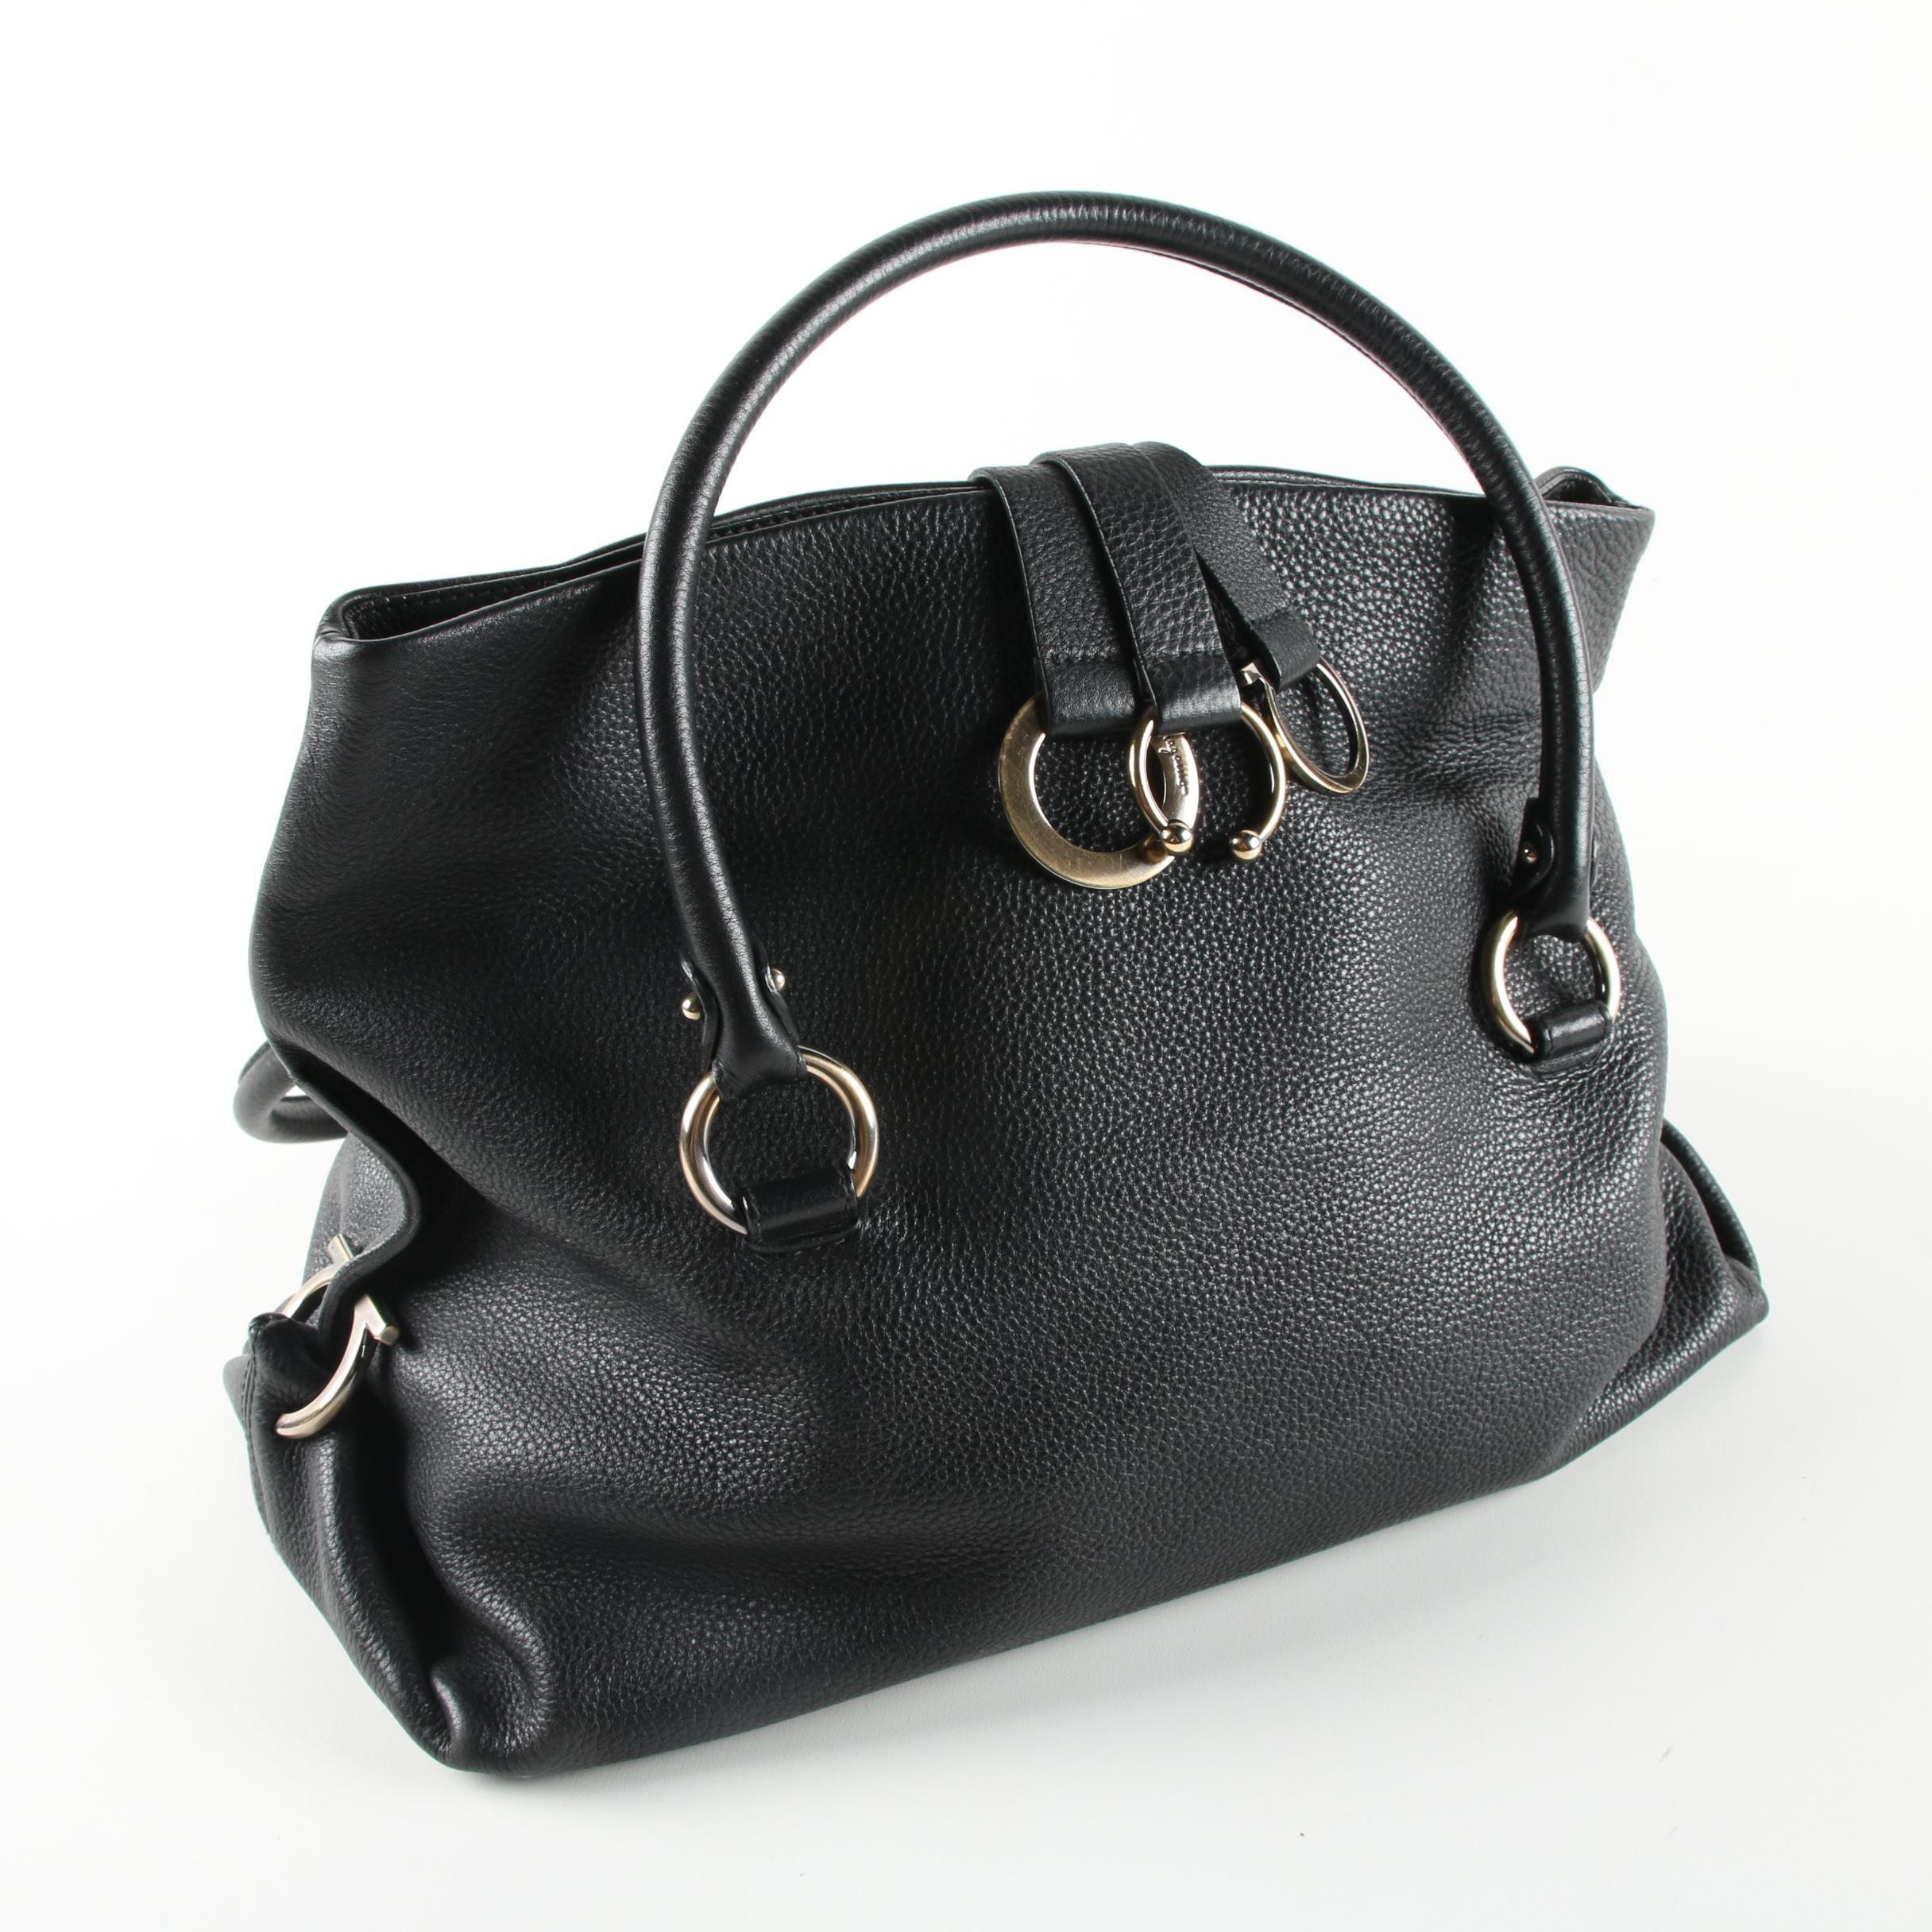 Salvatore Ferragamo Black Leather Gancini Hobo Bag